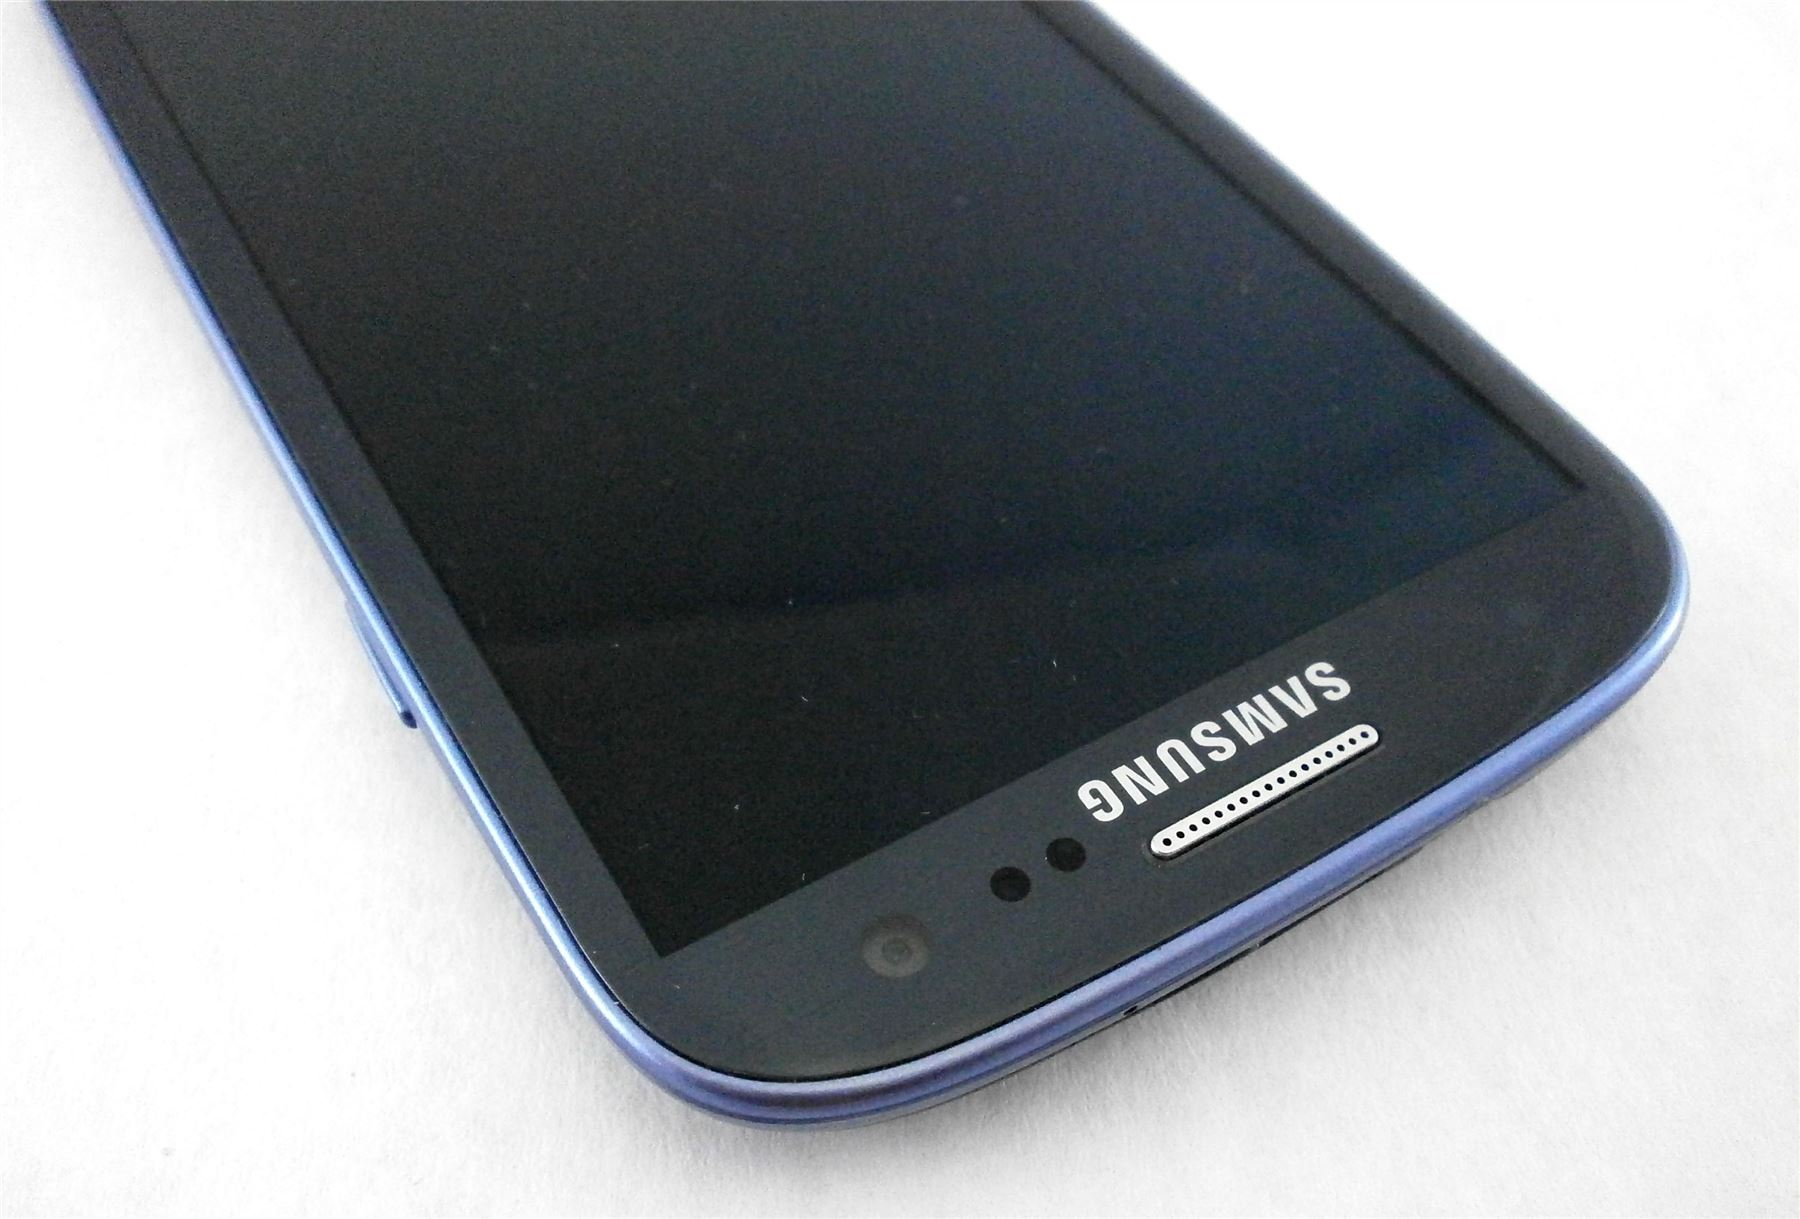 Samsung Galaxy S3 S Iii 16gb Cricket 4g Smartphone Sch